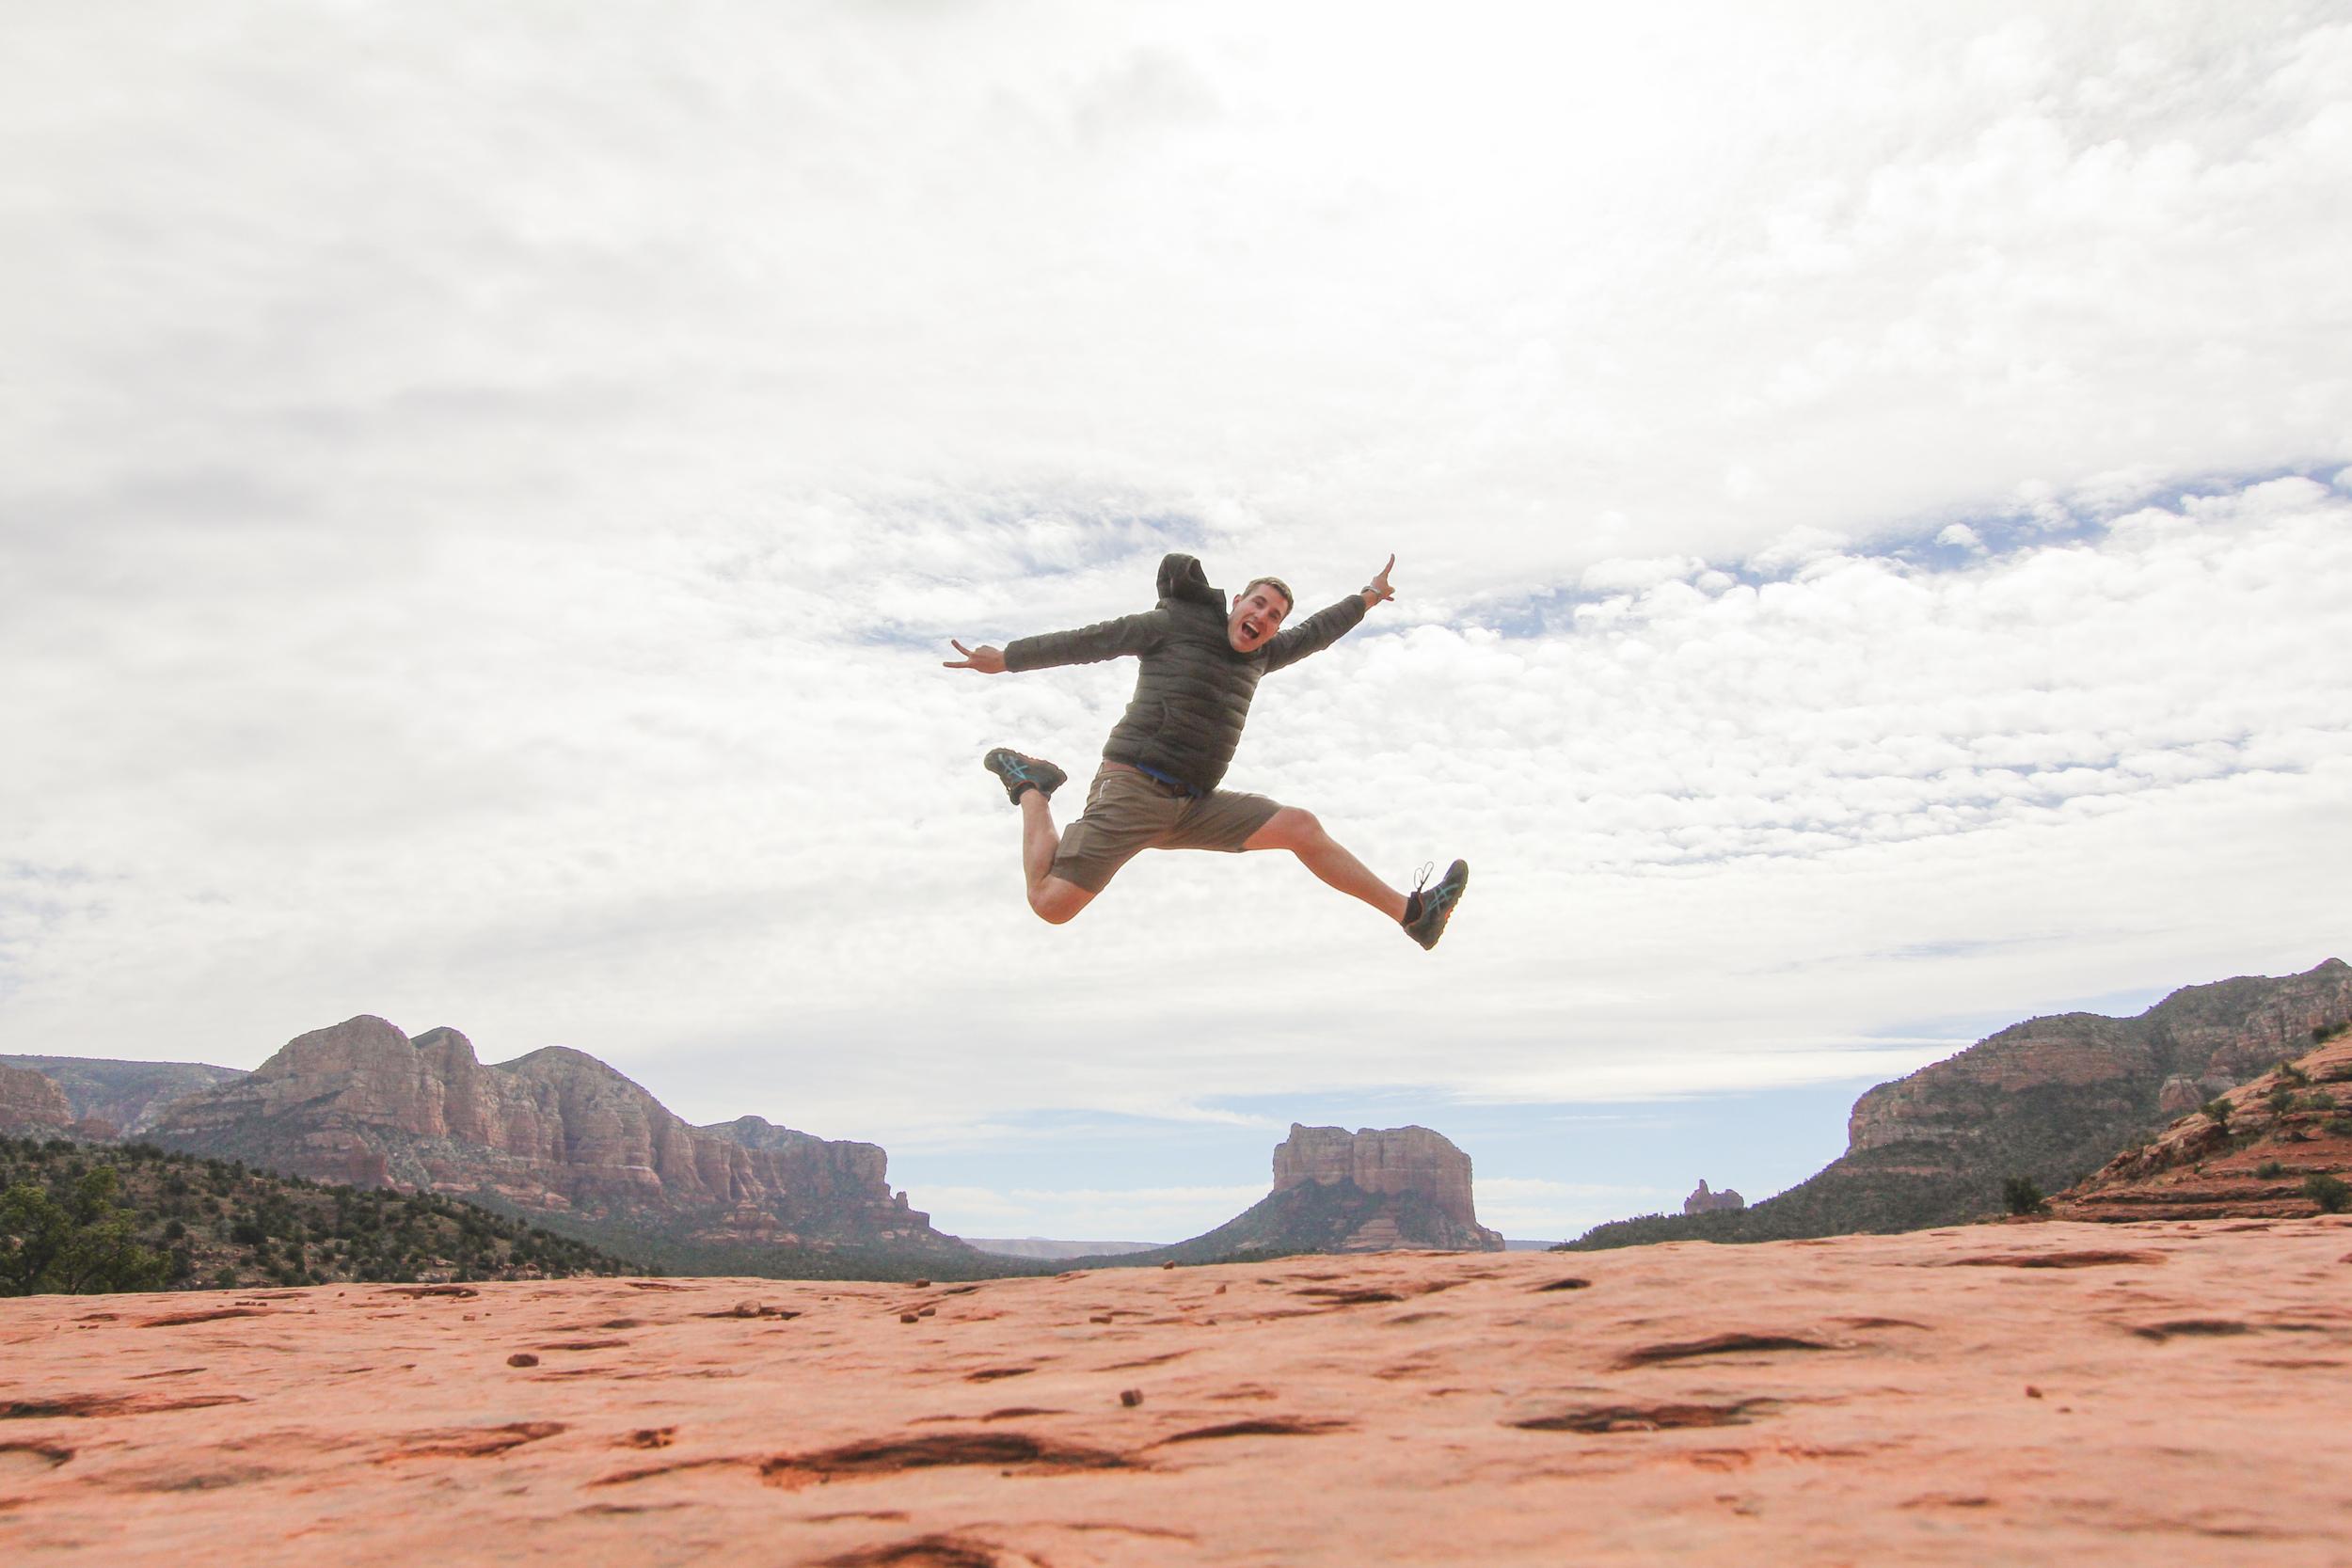 Honeymoon_Tuesday_Sedona_Arizona_JonCourvillePhotography-9.jpg